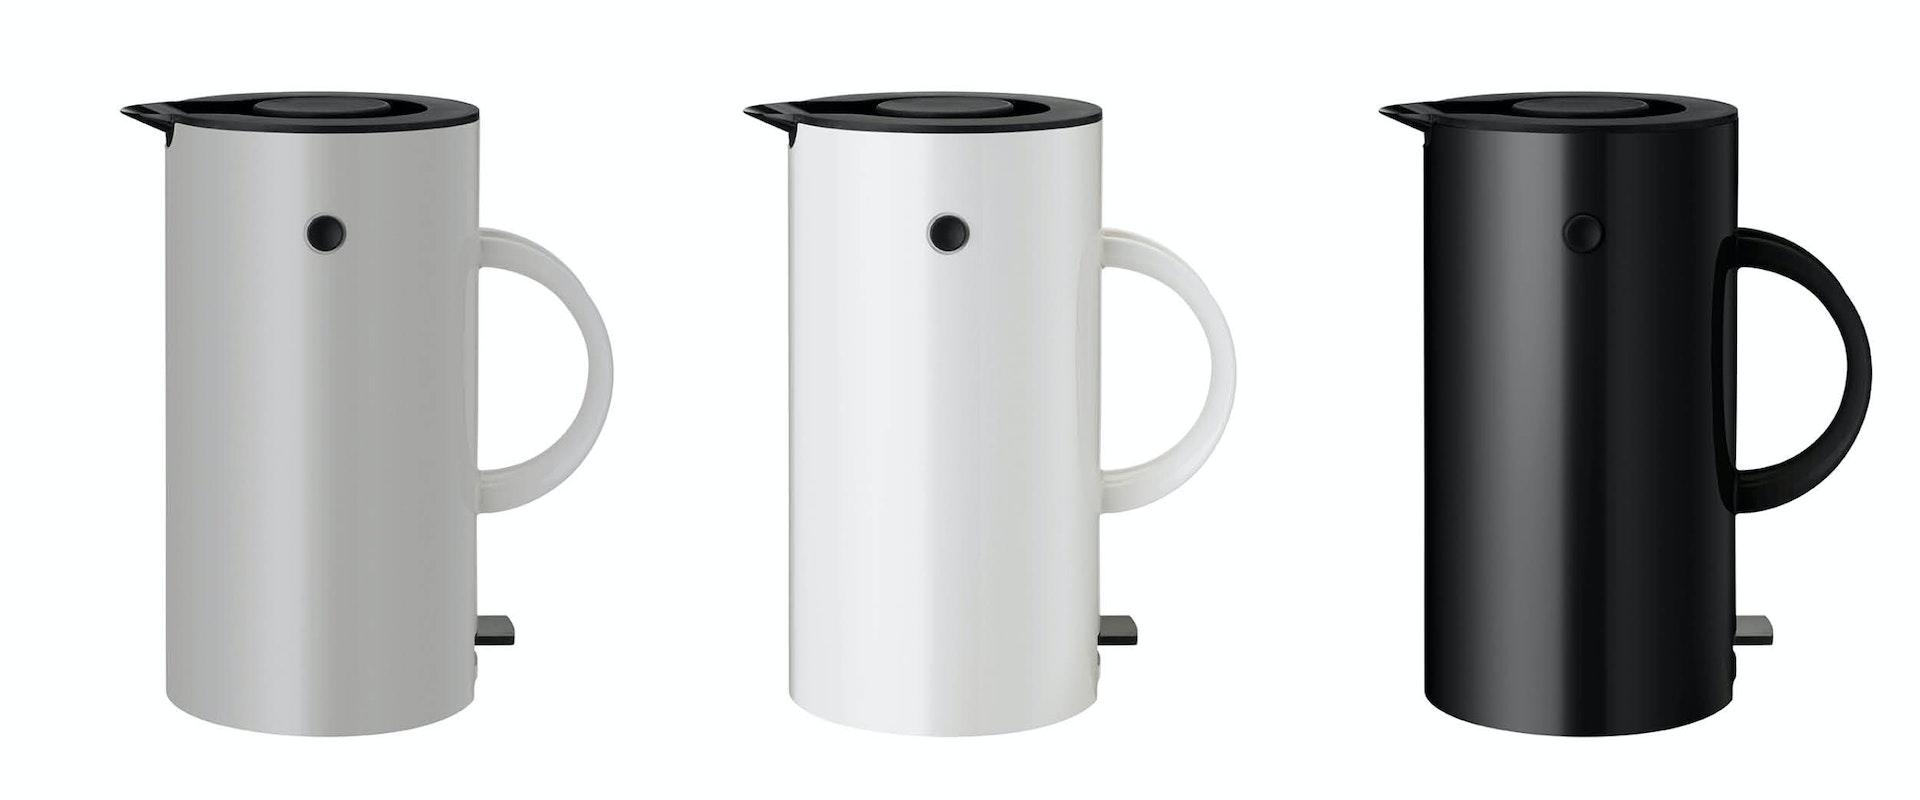 Splinterny Stelton lancerer designklassiker som elkedel | bobedre.dk GV91